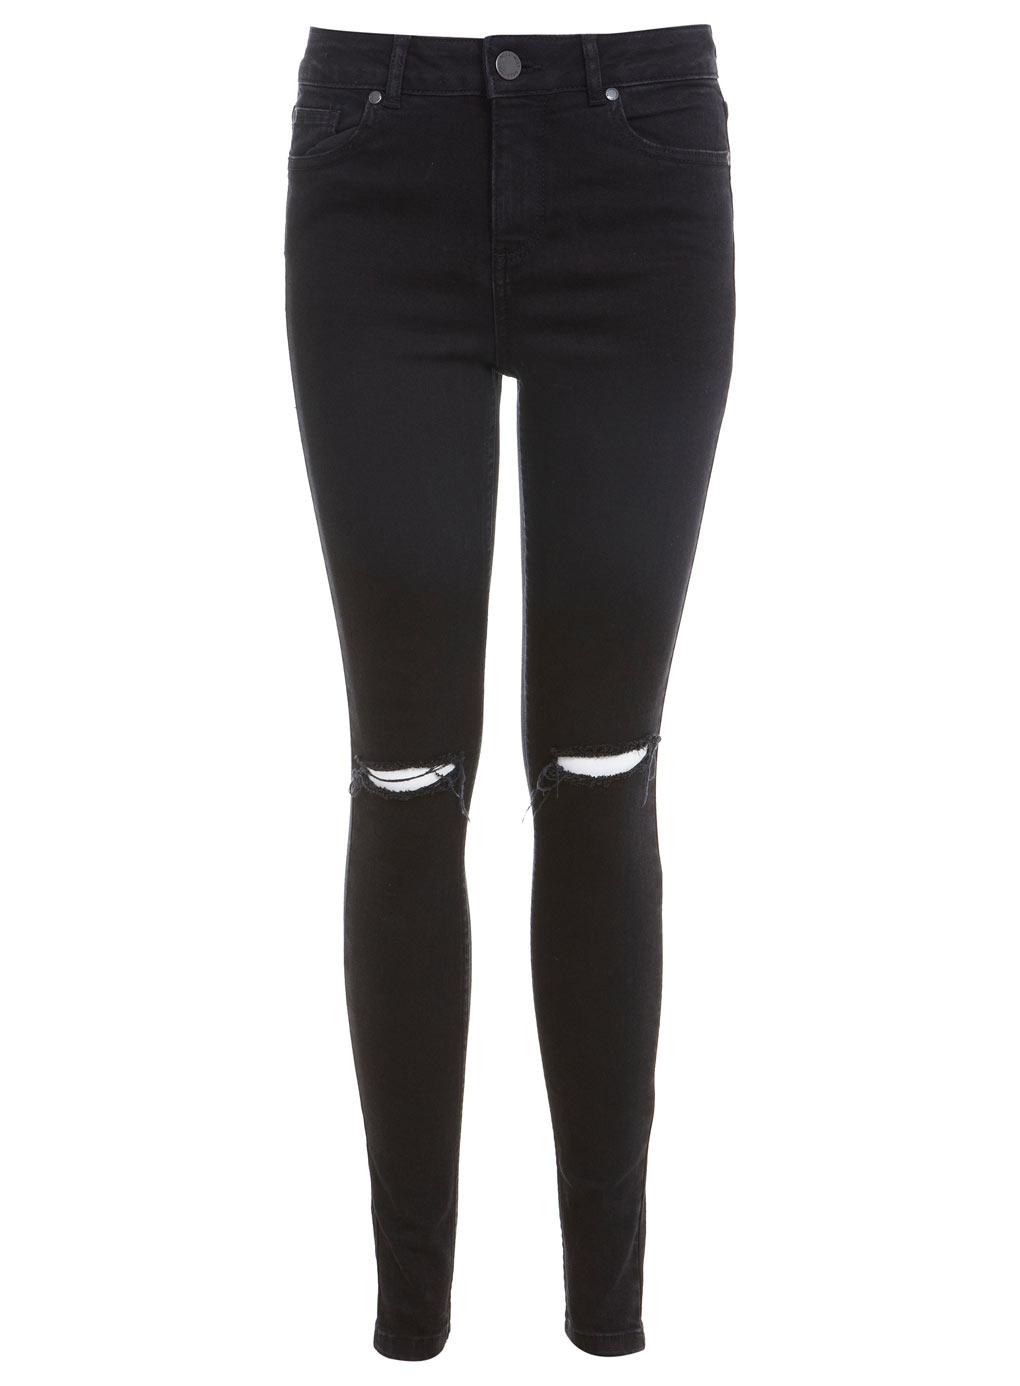 Black Razor Knee Jean - Premium Preview - Clothing